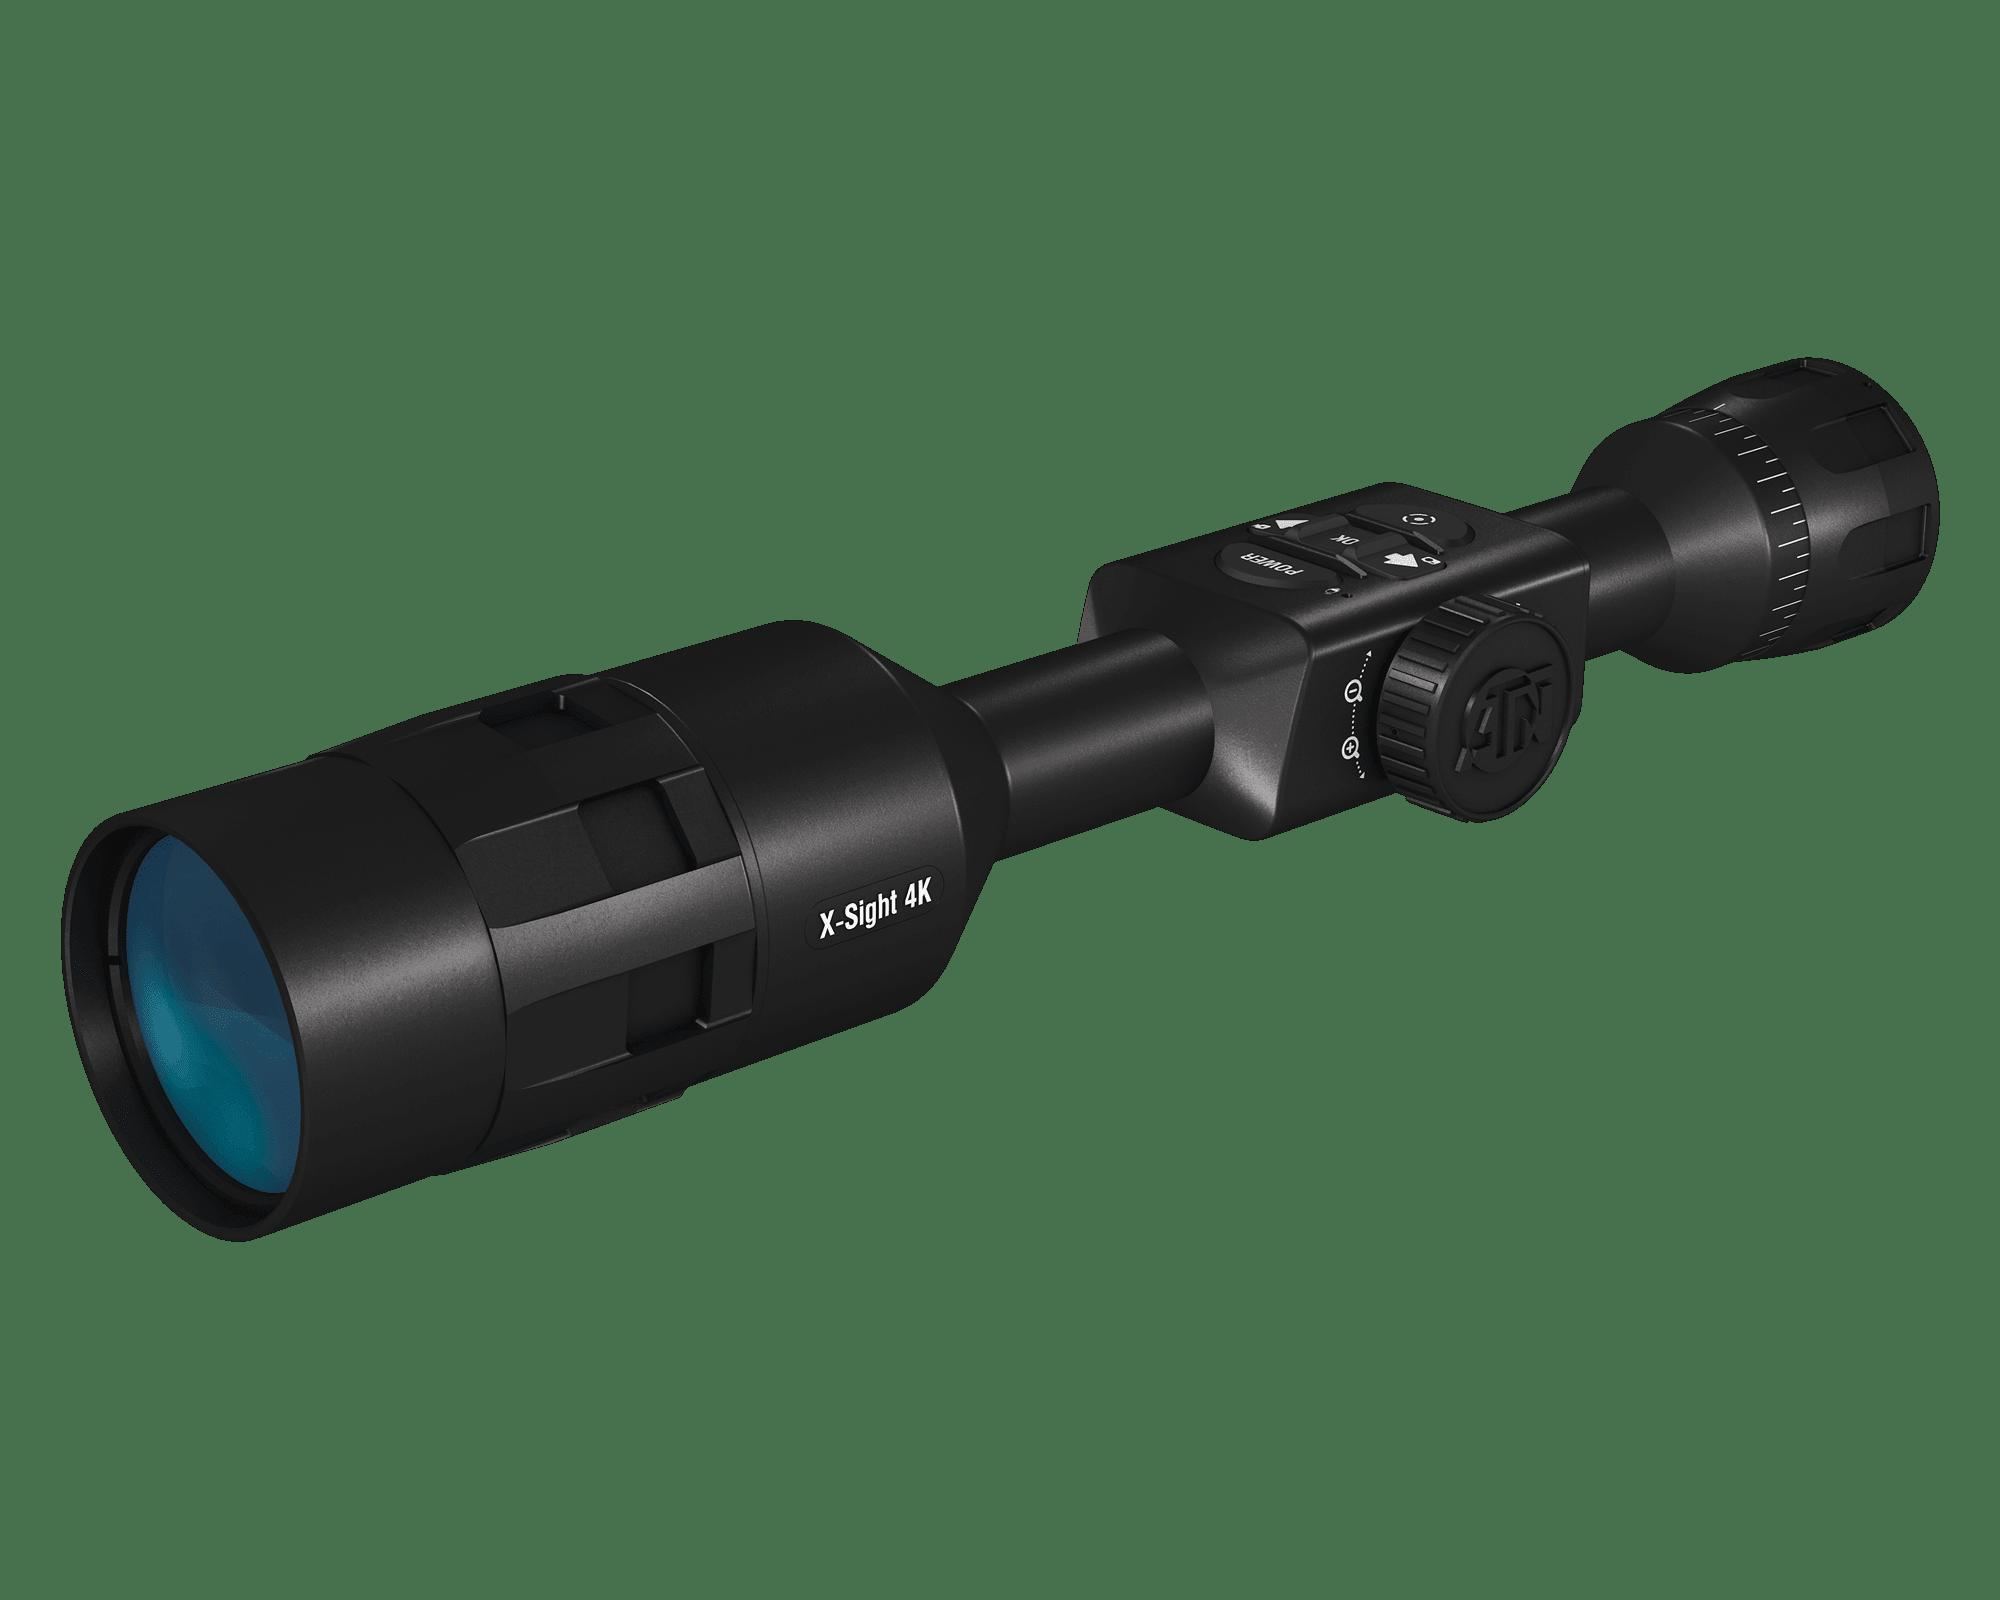 X-Sight 4k Pro 5-20